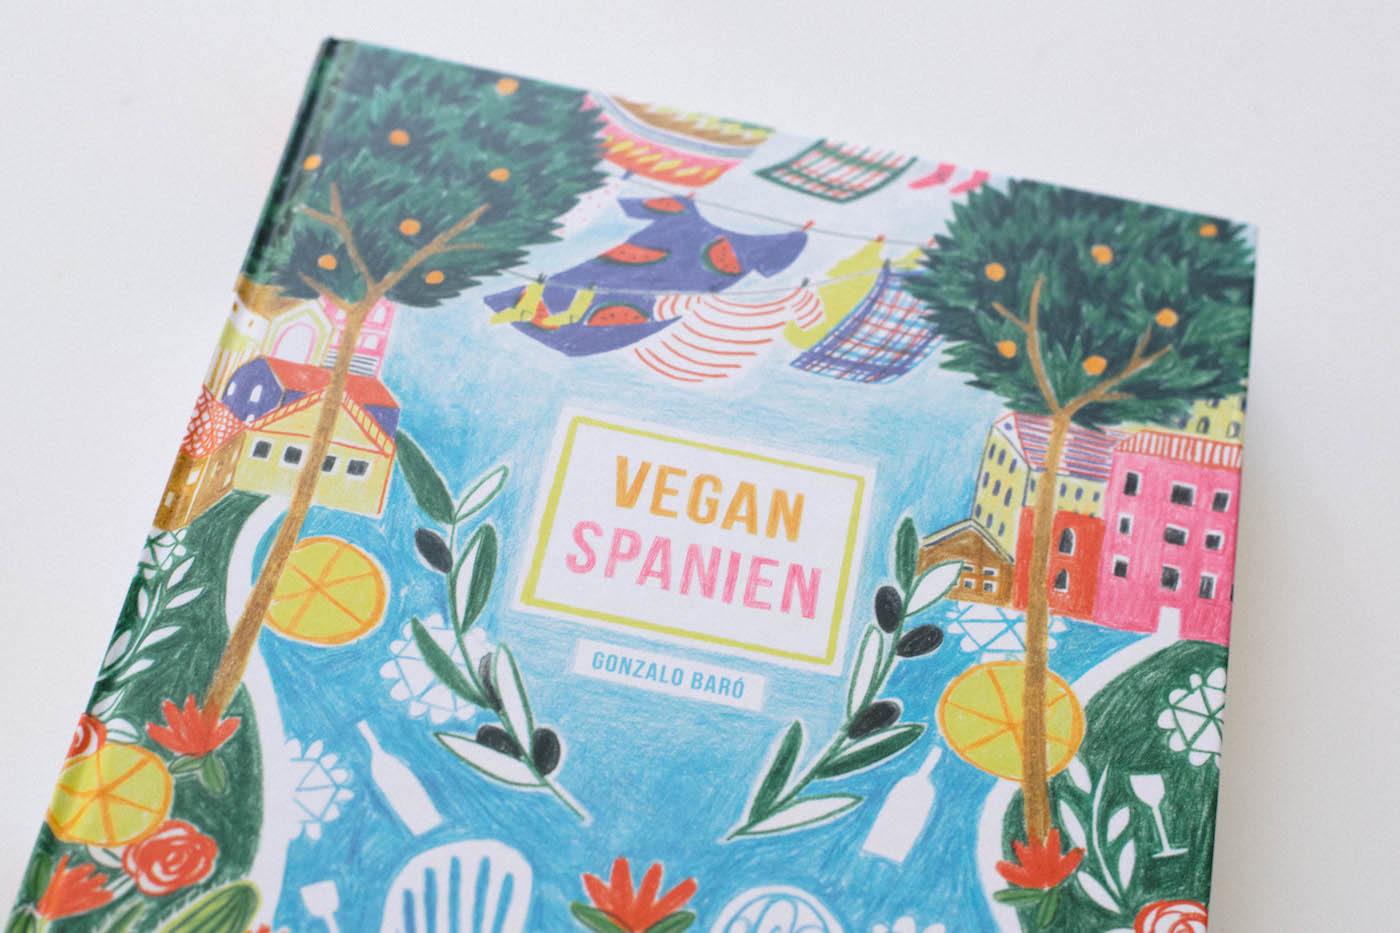 Vegan Spanien